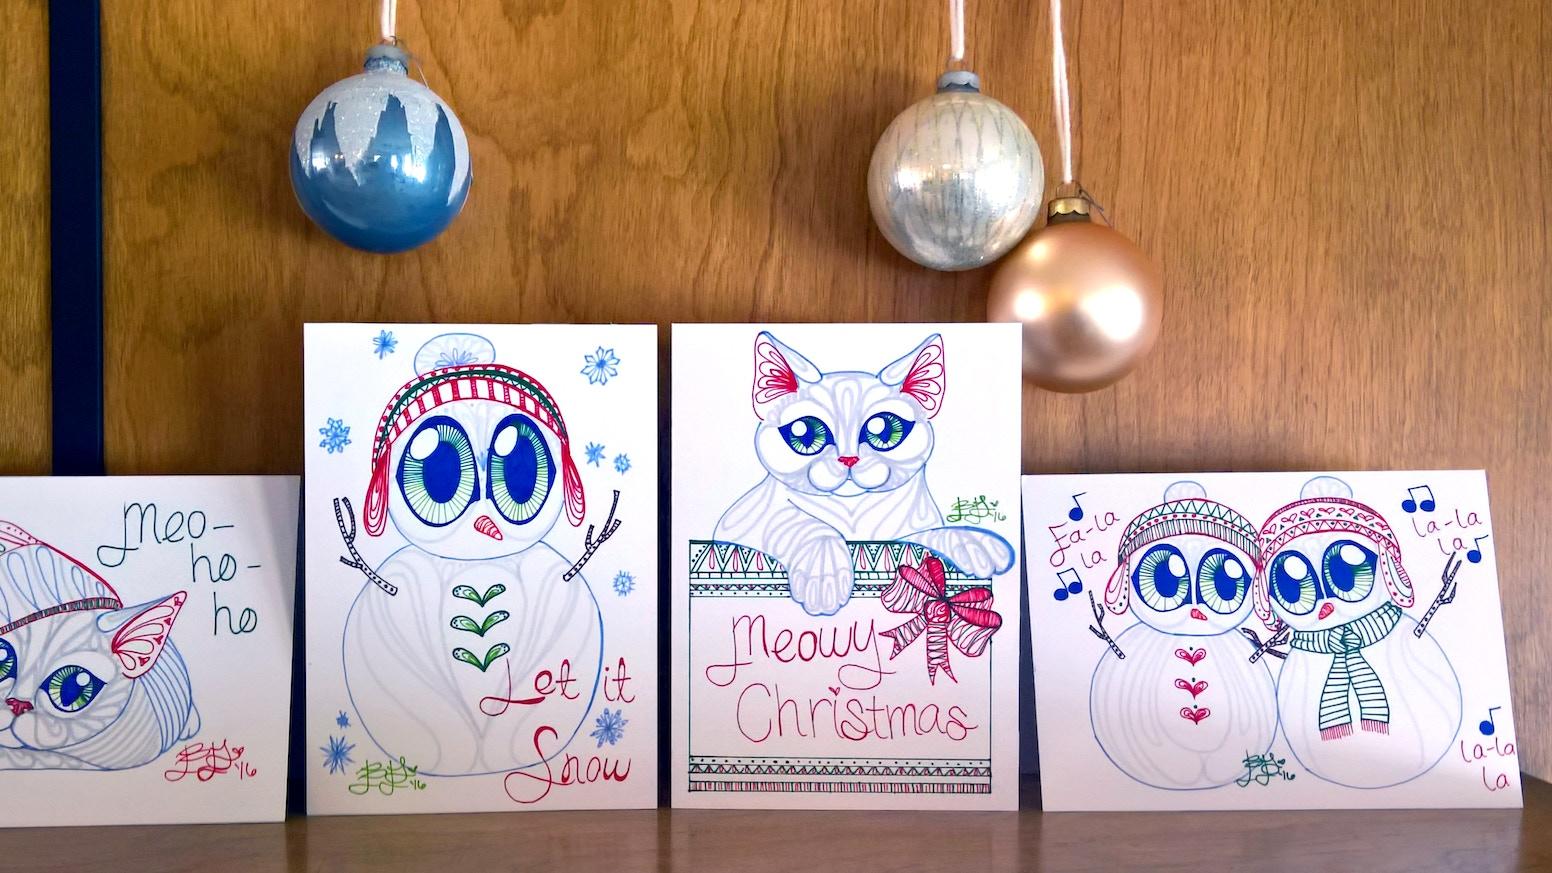 brelynne s christmas card art by brelynne gunderson kickstarter